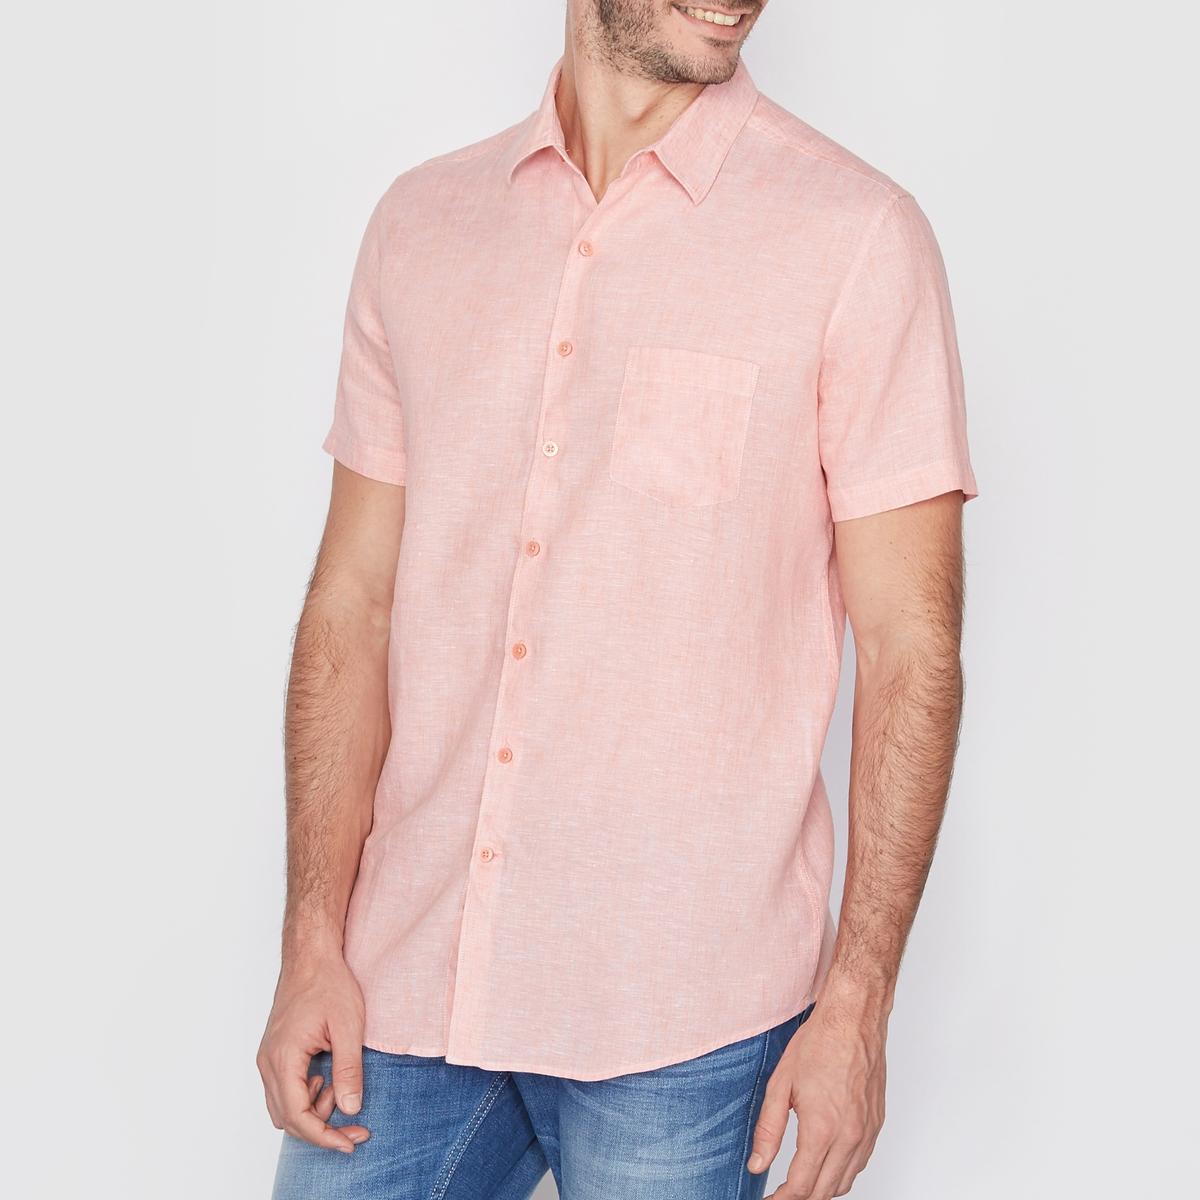 Рубашка прямого покроя с короткими рукавами, 100% лен<br><br>Цвет: оранжевый меланж<br>Размер: 37/38